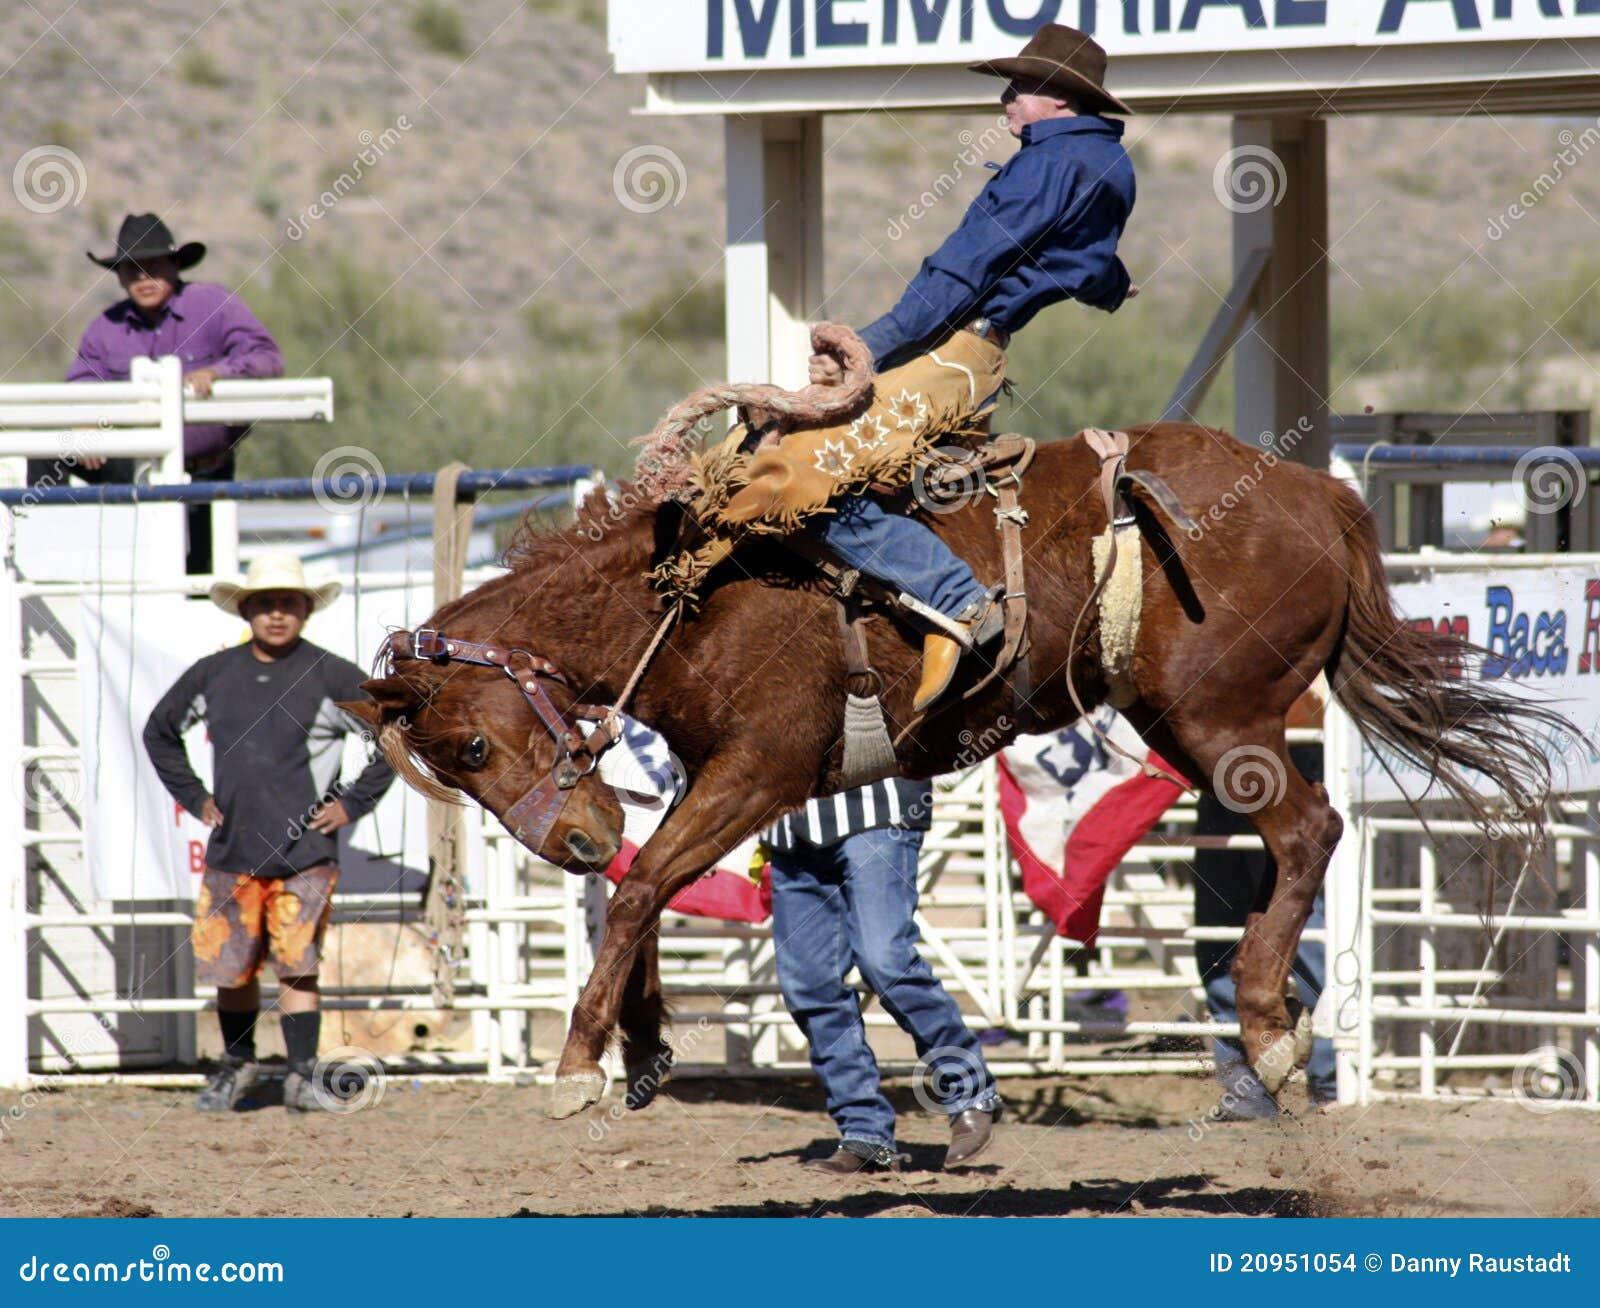 Rodeo Bucking Bronc Rider Editorial Stock Image Image